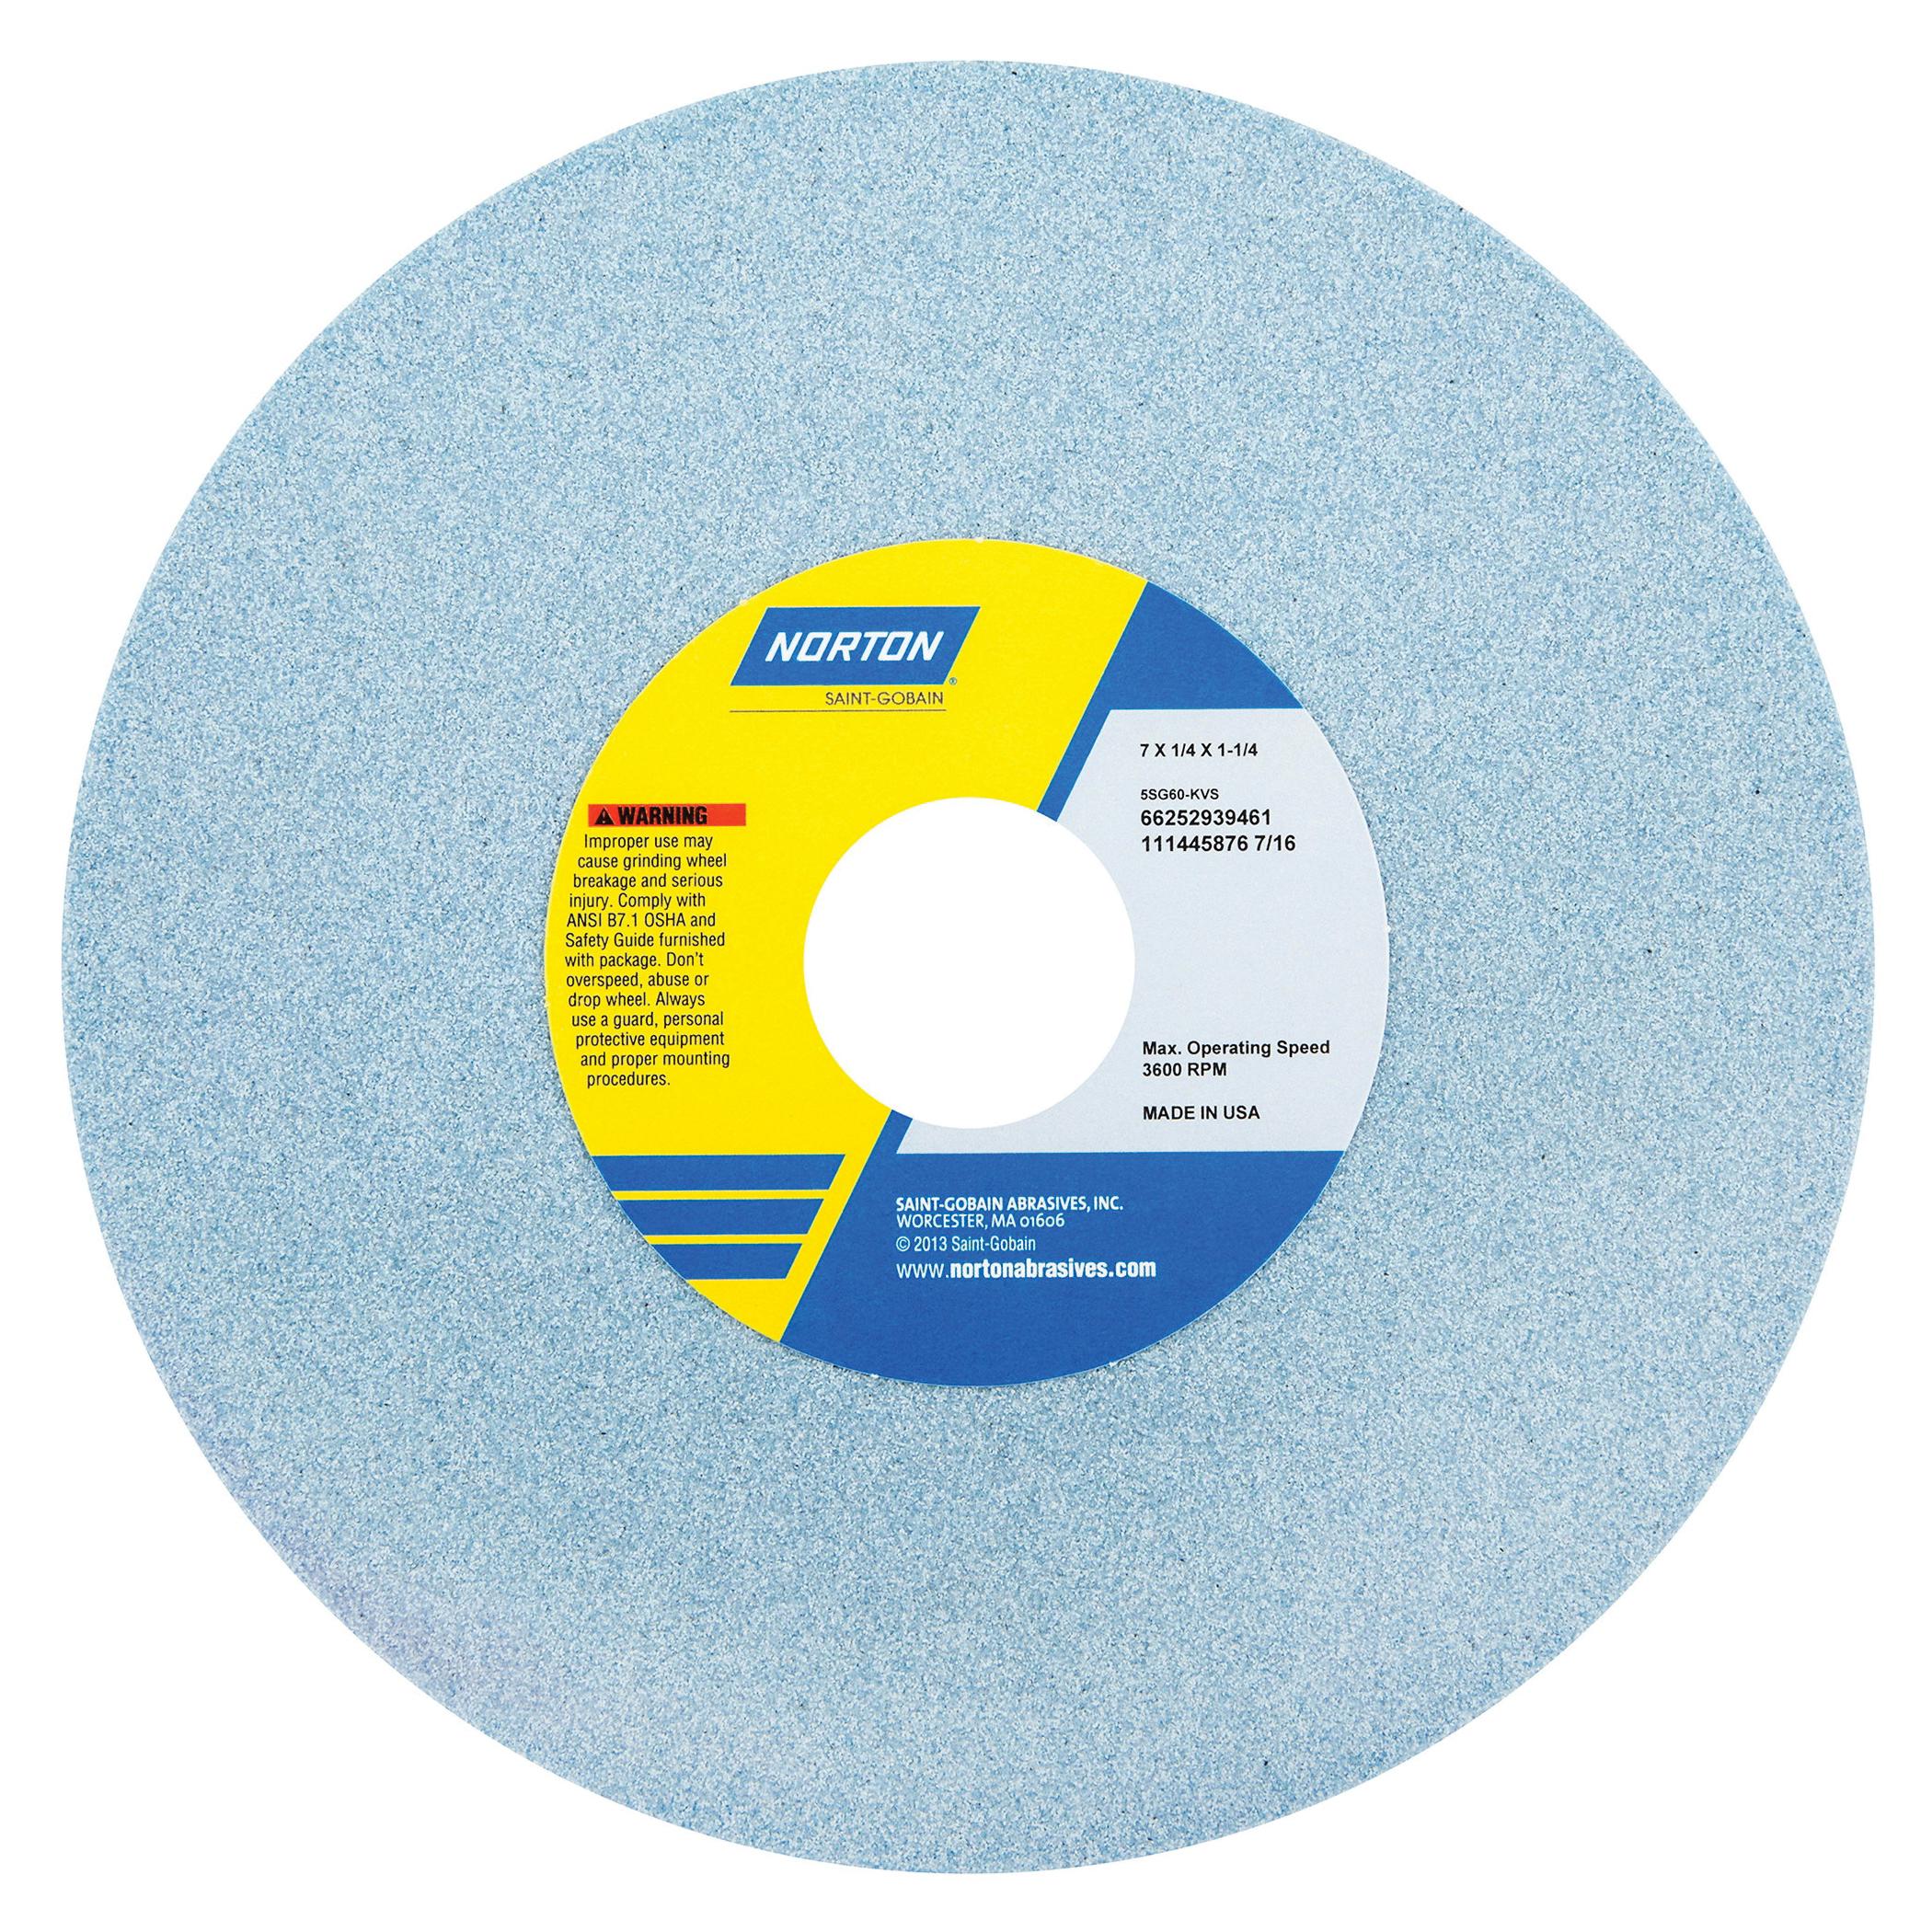 Norton® 66252939463 5SG Straight Toolroom Wheel, 7 in Dia x 1/4 in THK, 1-1/4 in Center Hole, 80 Grit, Ceramic Alumina/Friable Aluminum Oxide Abrasive